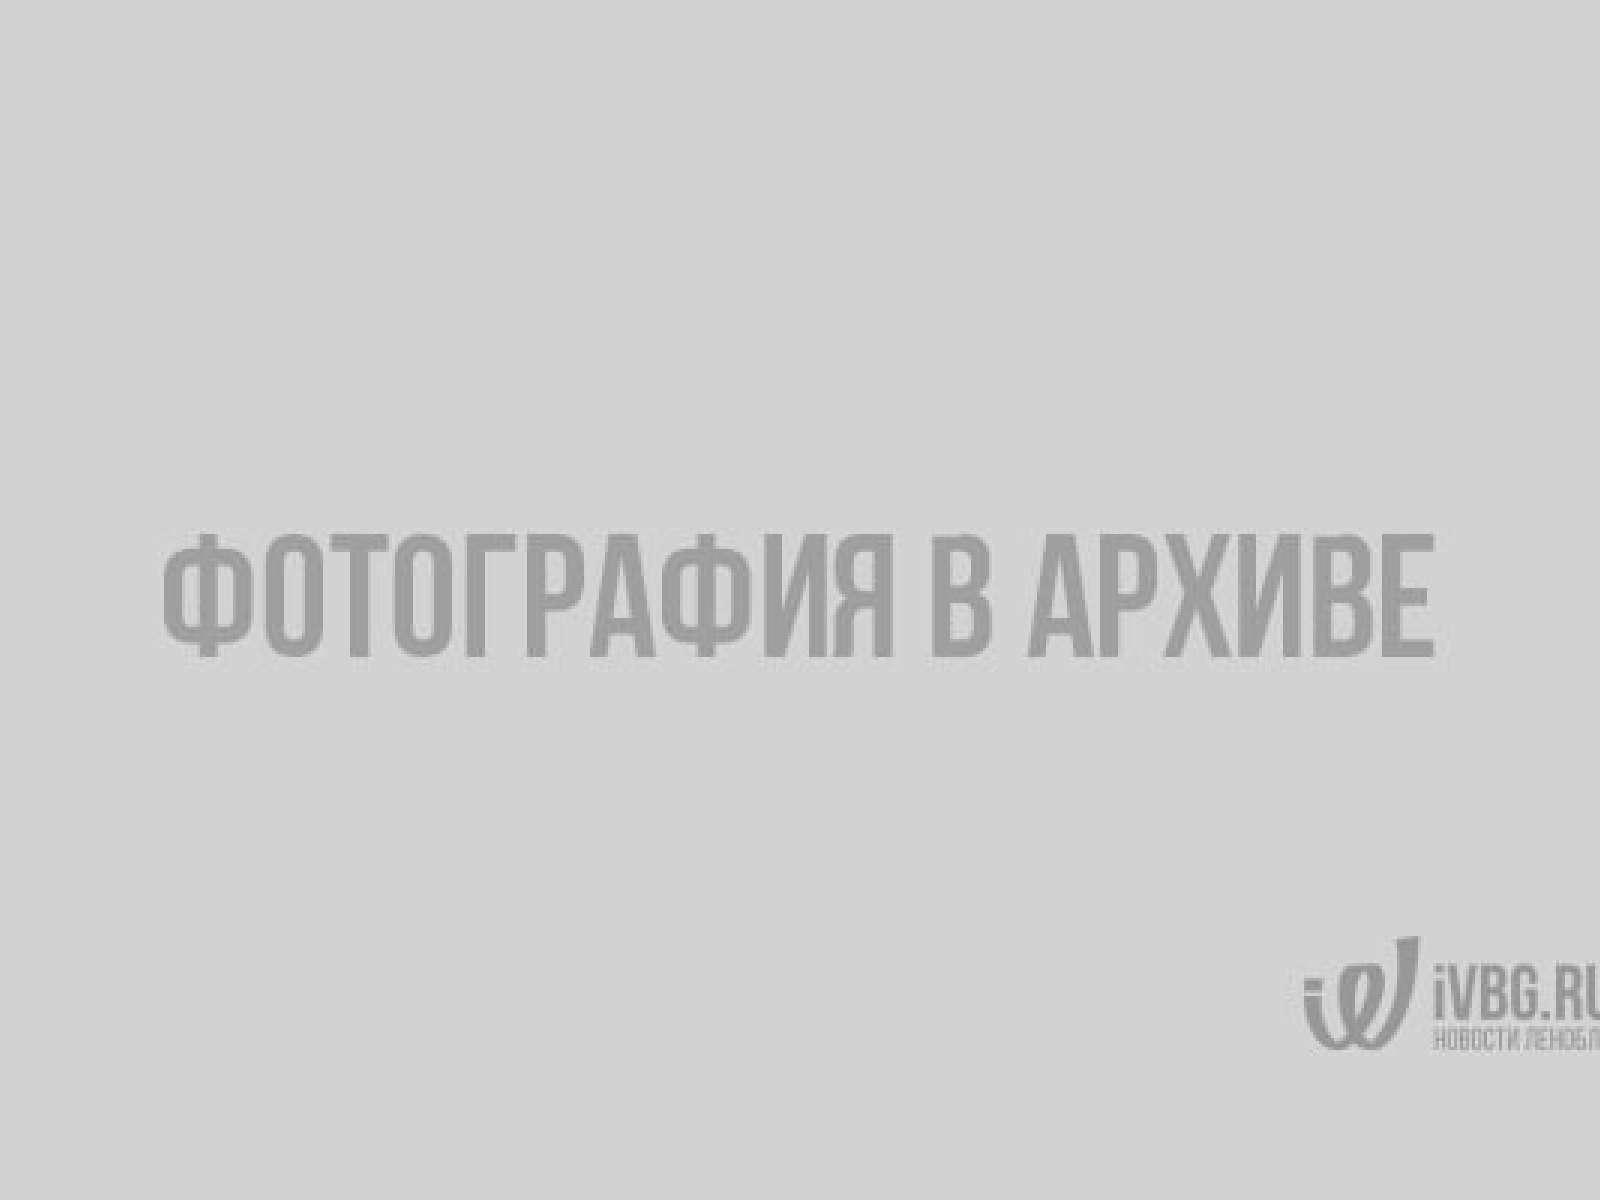 Фото: в Кудрово мопедист влетел в бок легковушки фото, Кудрово, ДТП, Всеволожский район, авария